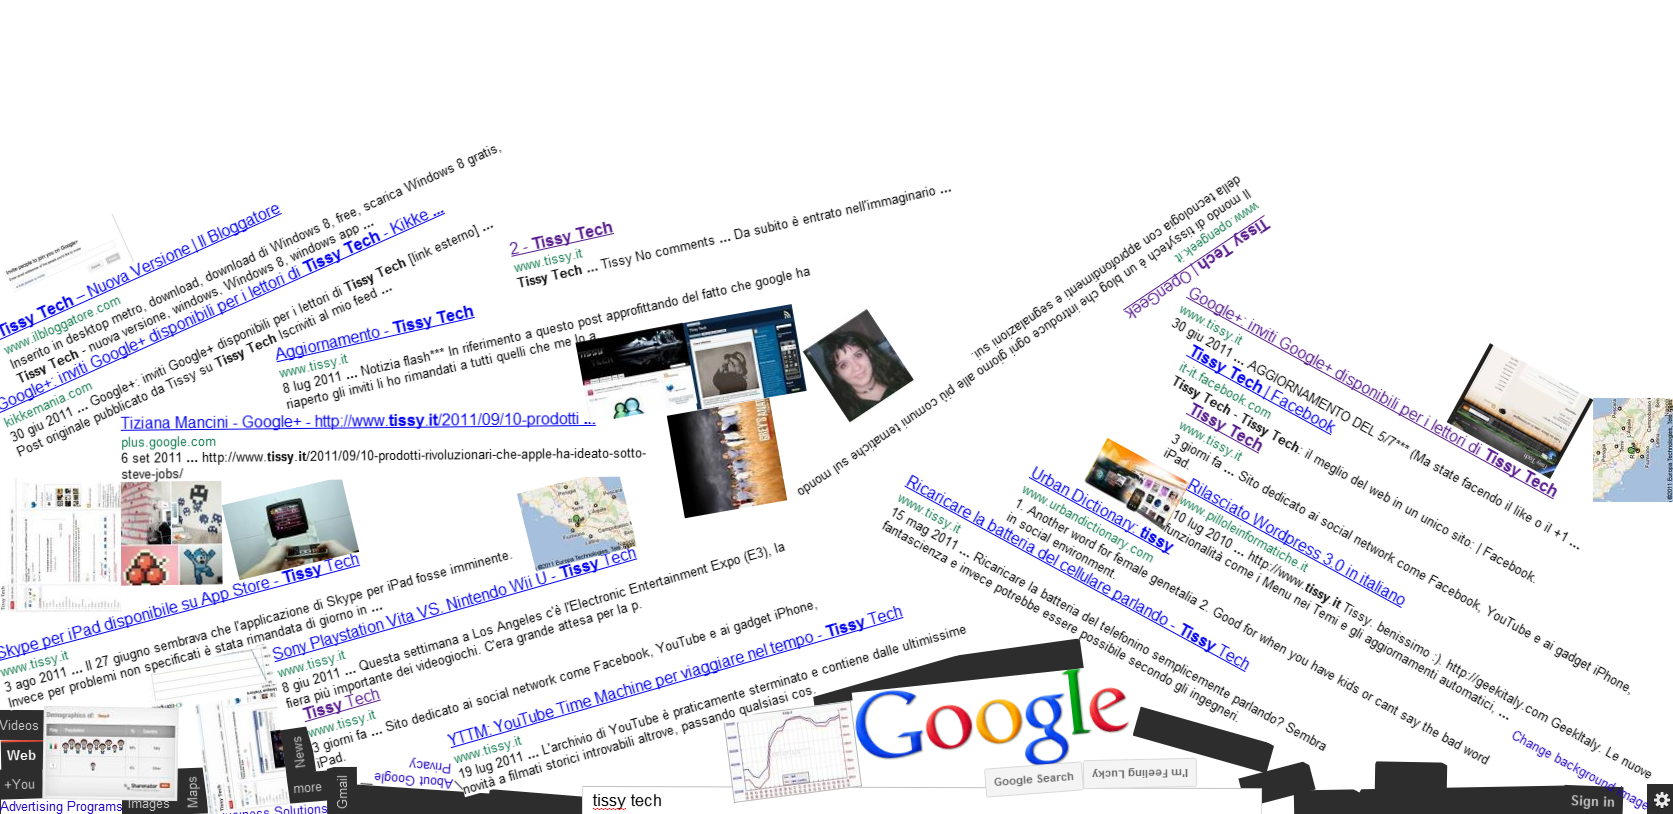 google-gravity-pic